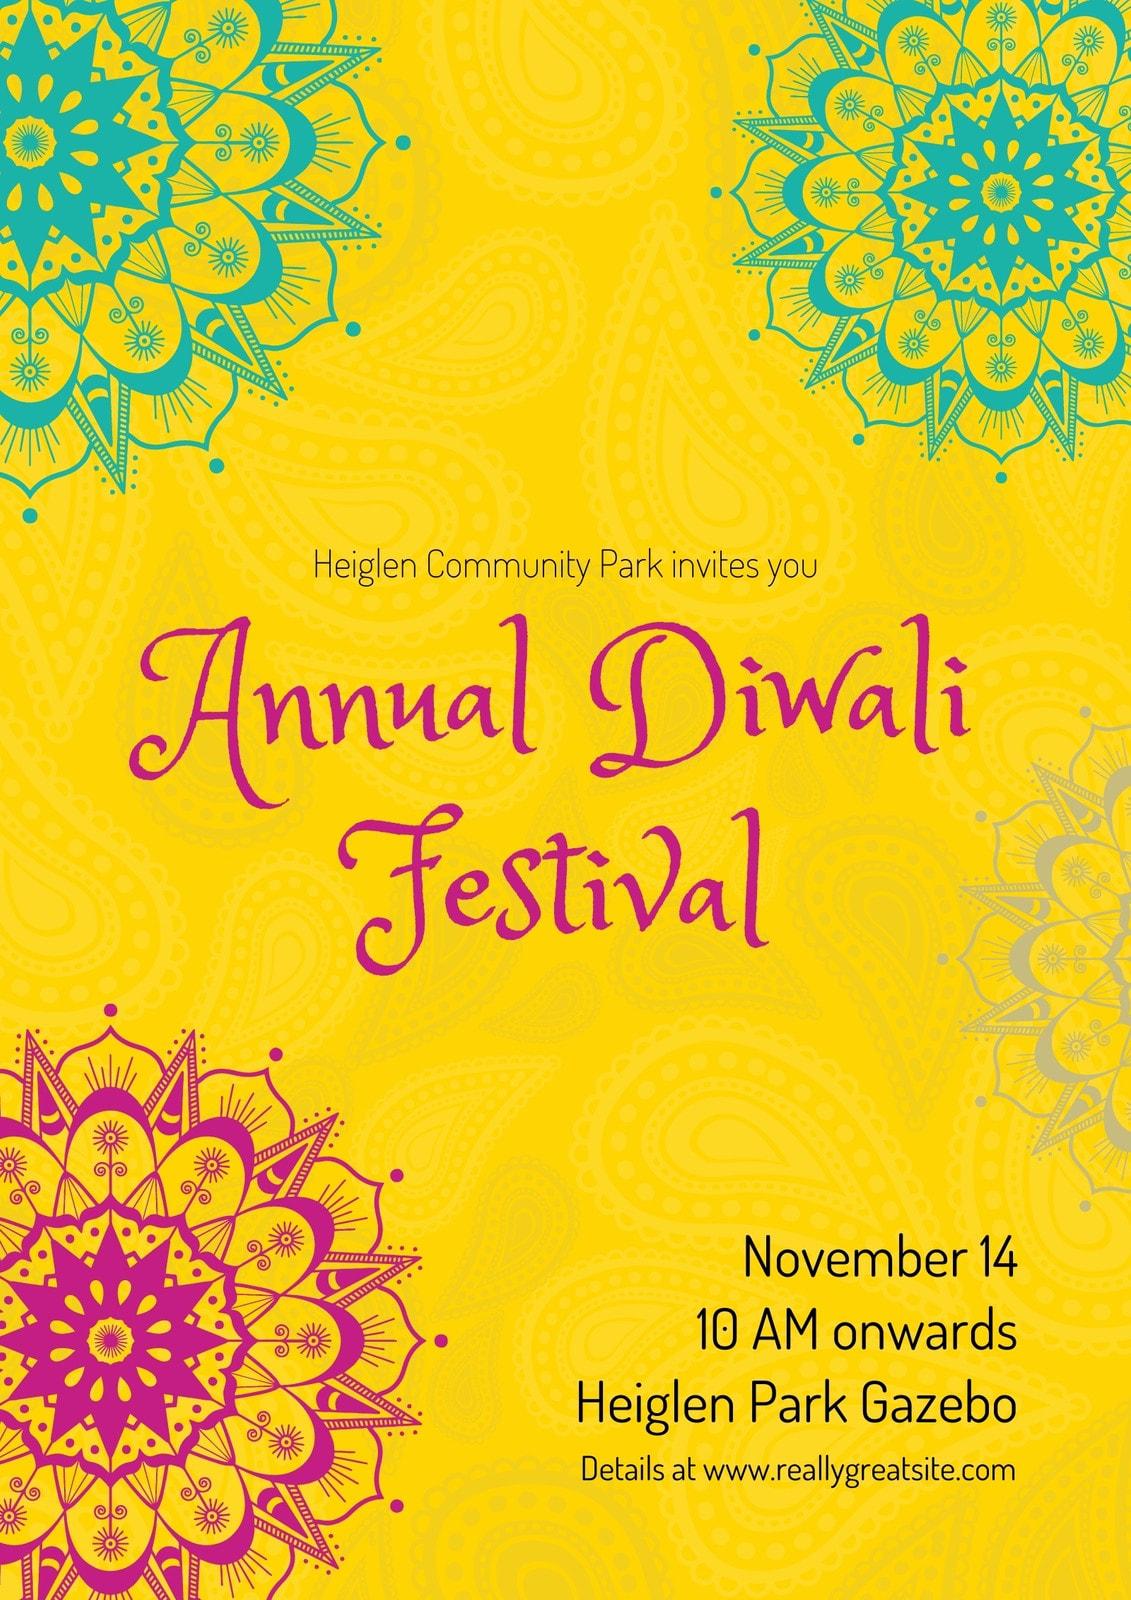 Yellow, Pink and Teal Minimal Diwali Poster